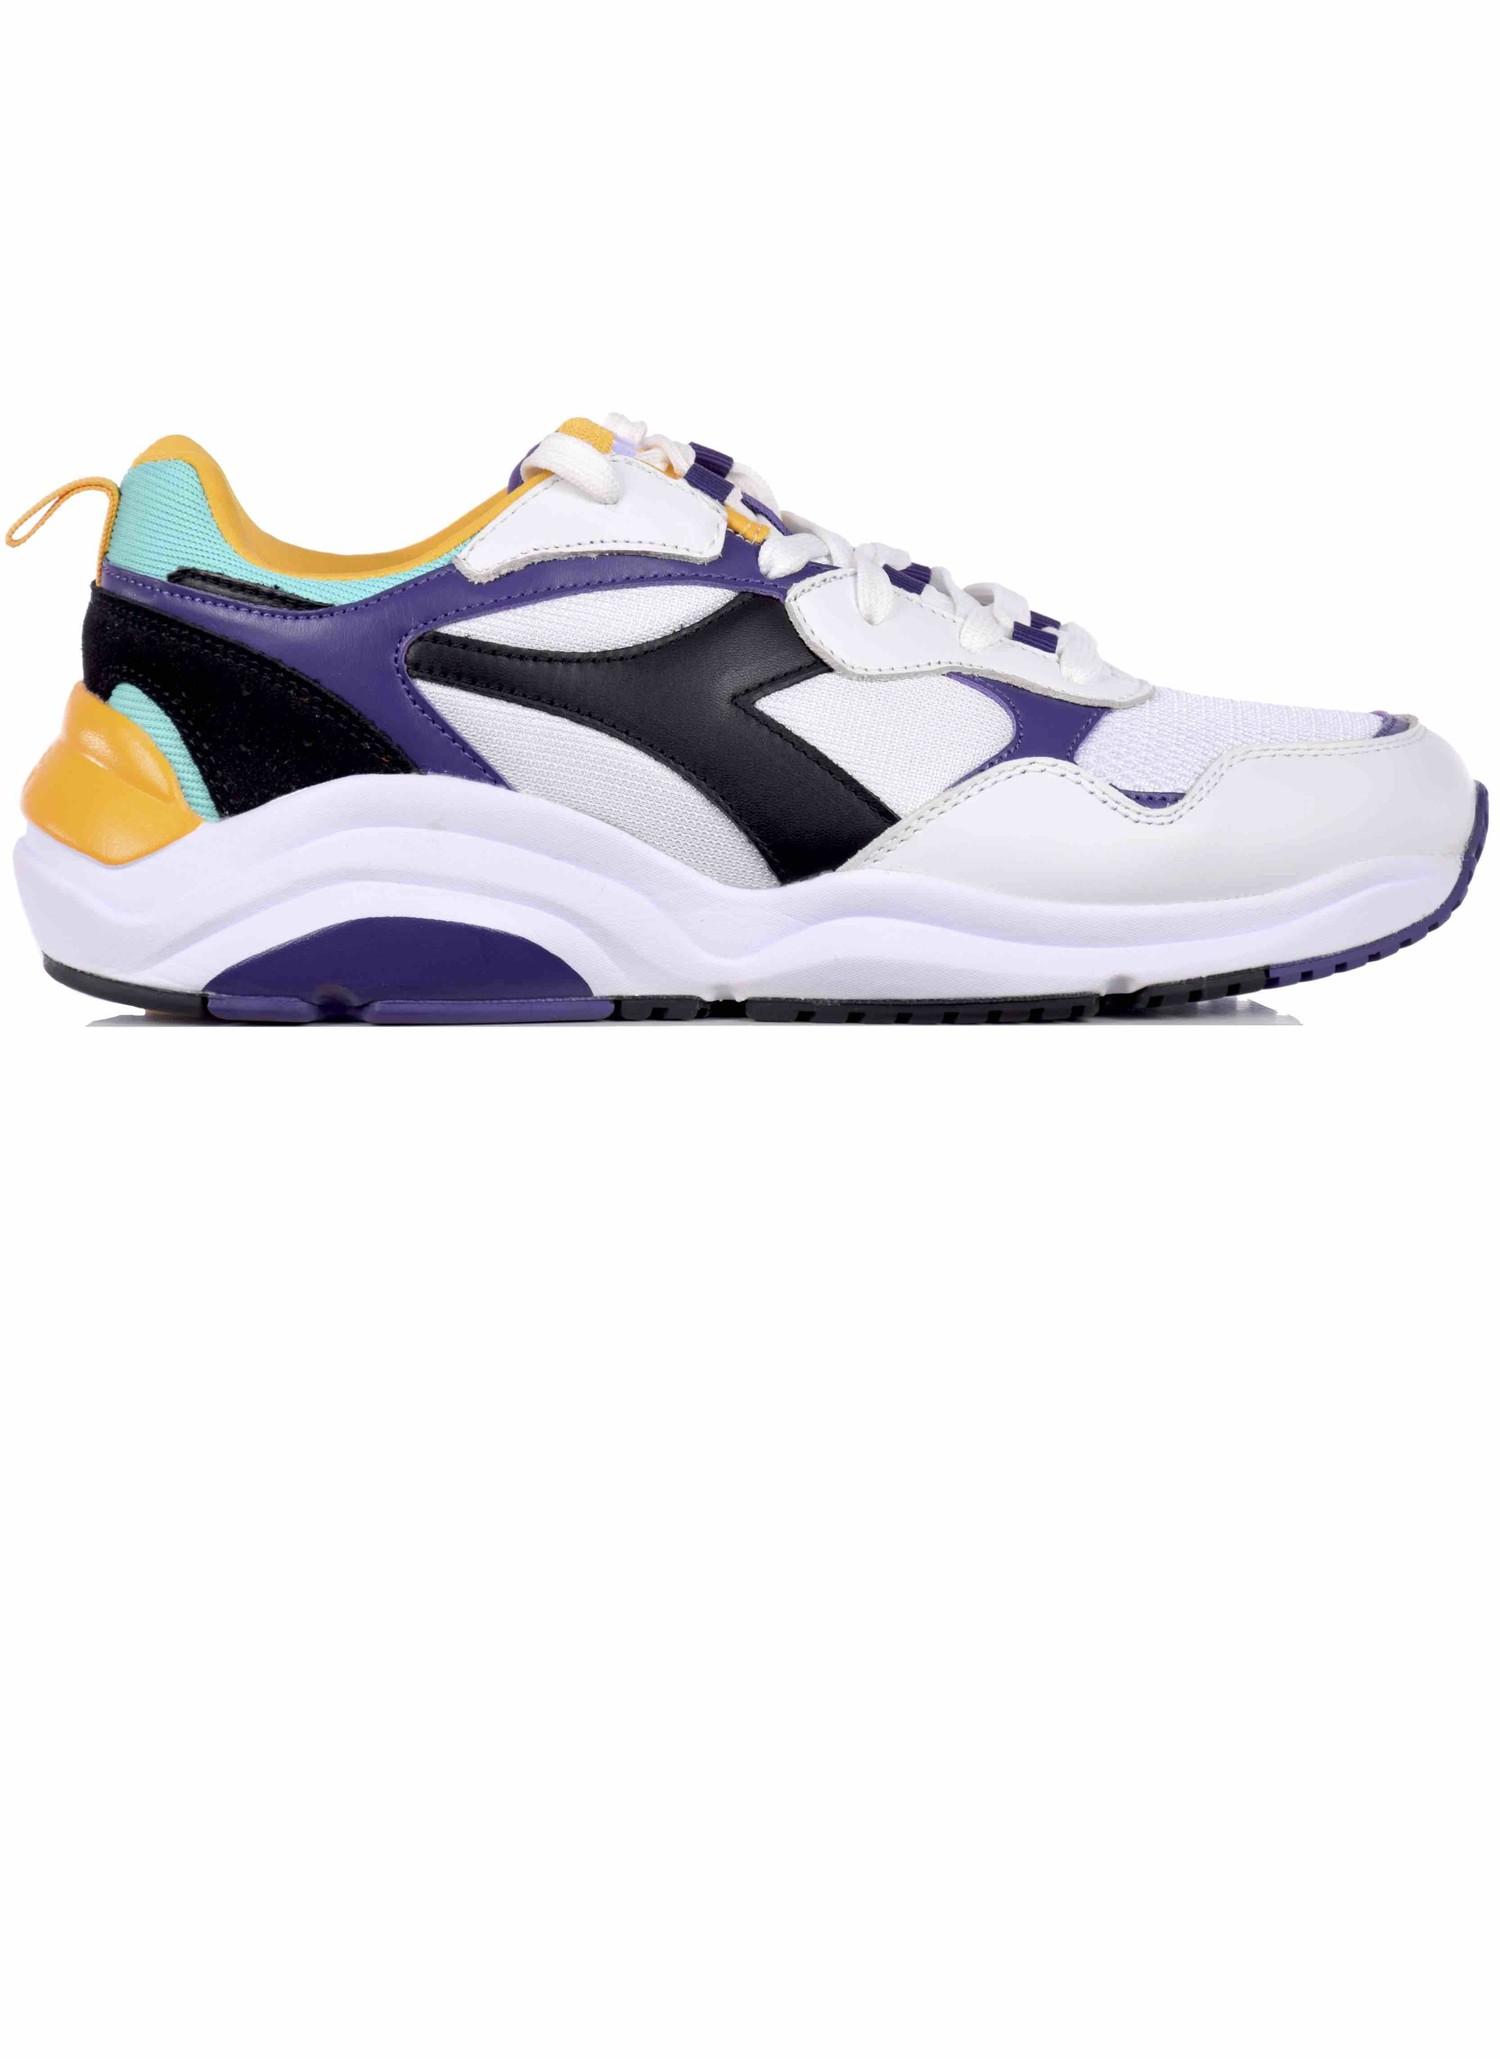 Diadora Whizz Run Sneakers Purple